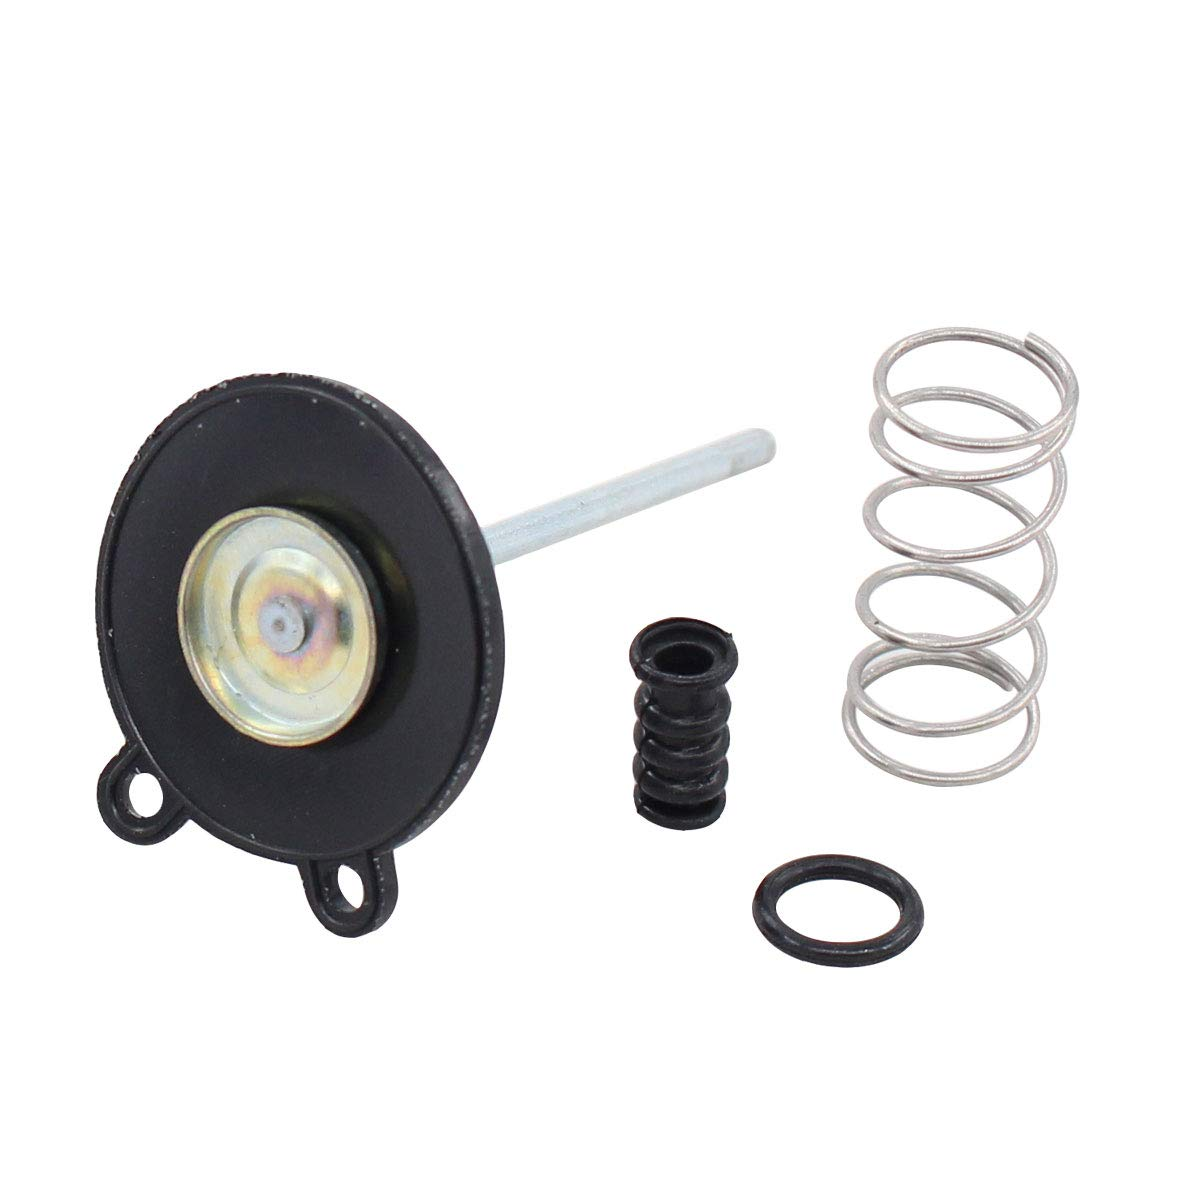 MOTOKU Carburetor Carb Accelerator Pump Diaphragm Rebuild Repair kit for Honda GL500 CX500 CM450 CX500 GL1100 GL1100I Goldwing Aspencade Interstate